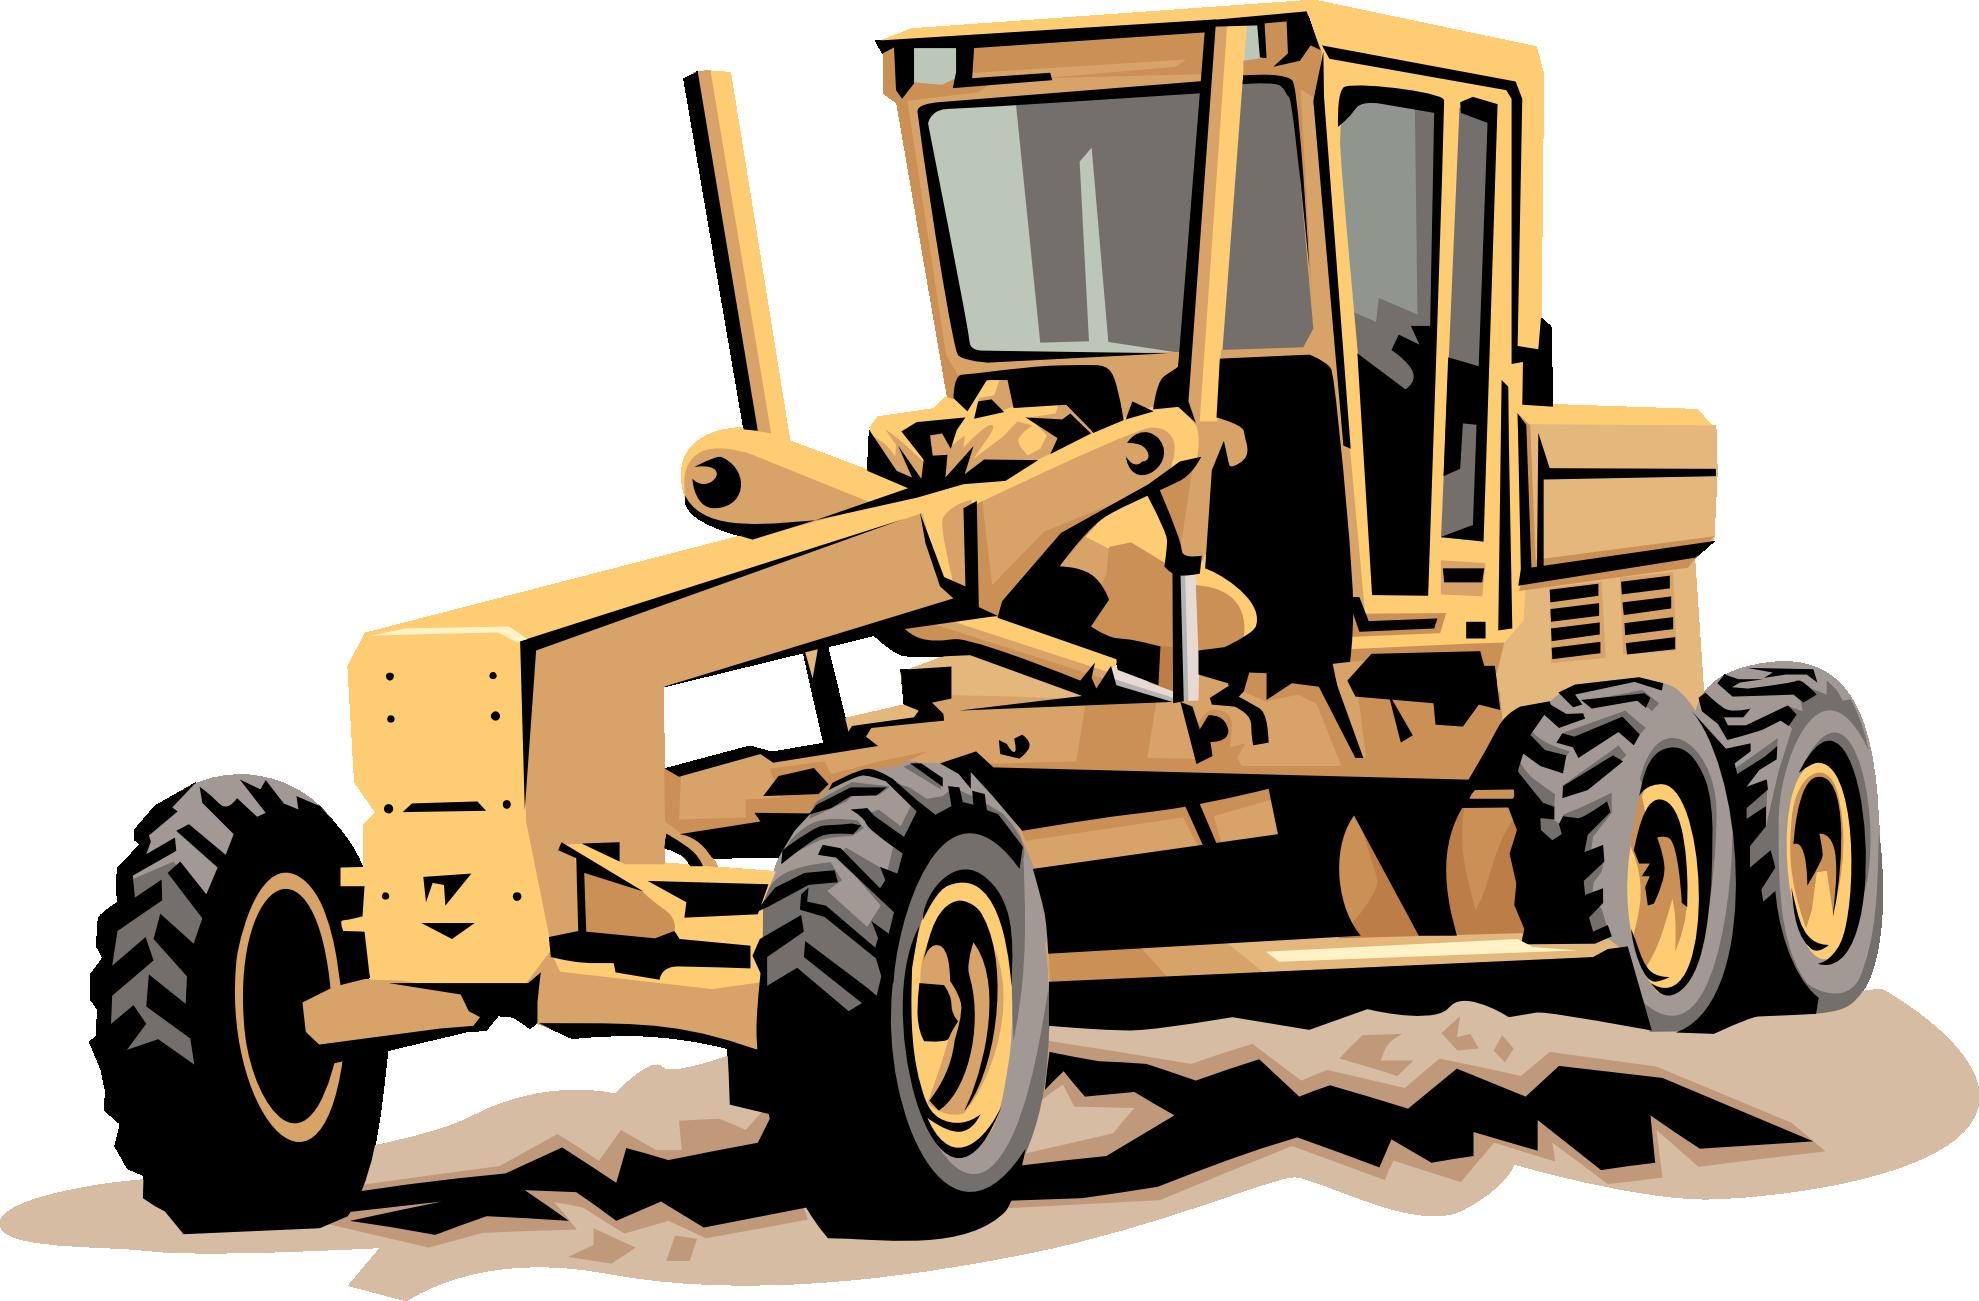 Heavy Equipment Clip Art - Clipart Libra-Heavy Equipment Clip Art - Clipart library-14